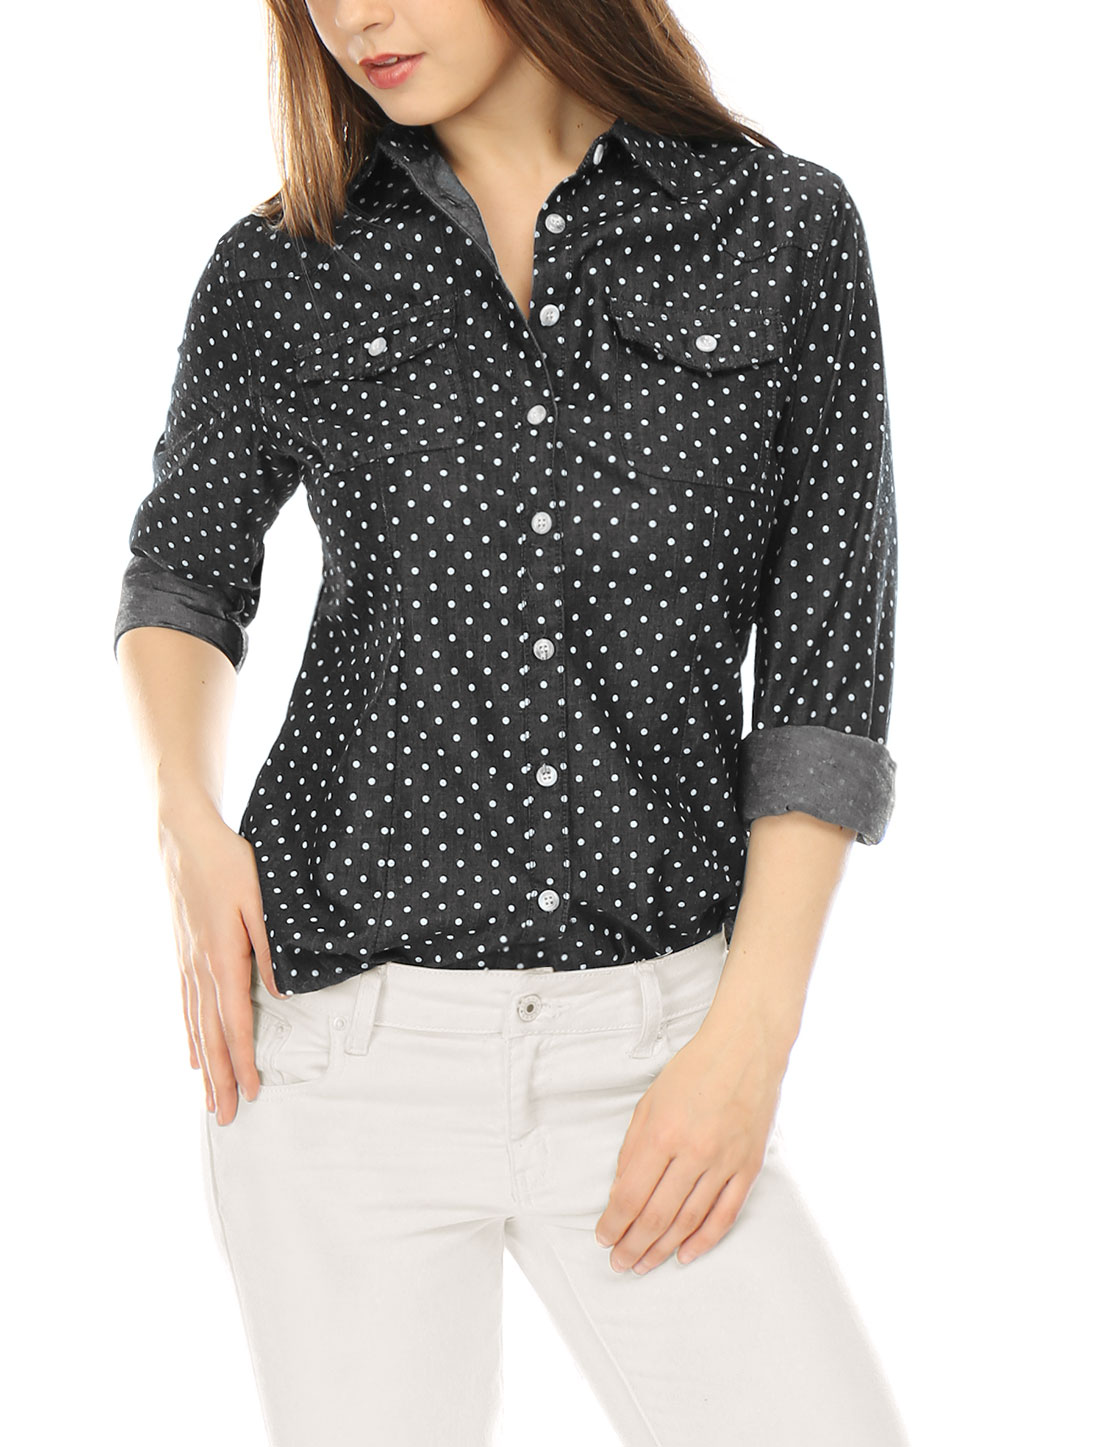 Allegra K Women Dots Point Collar Chest Pockets Button Down Shirt Black M